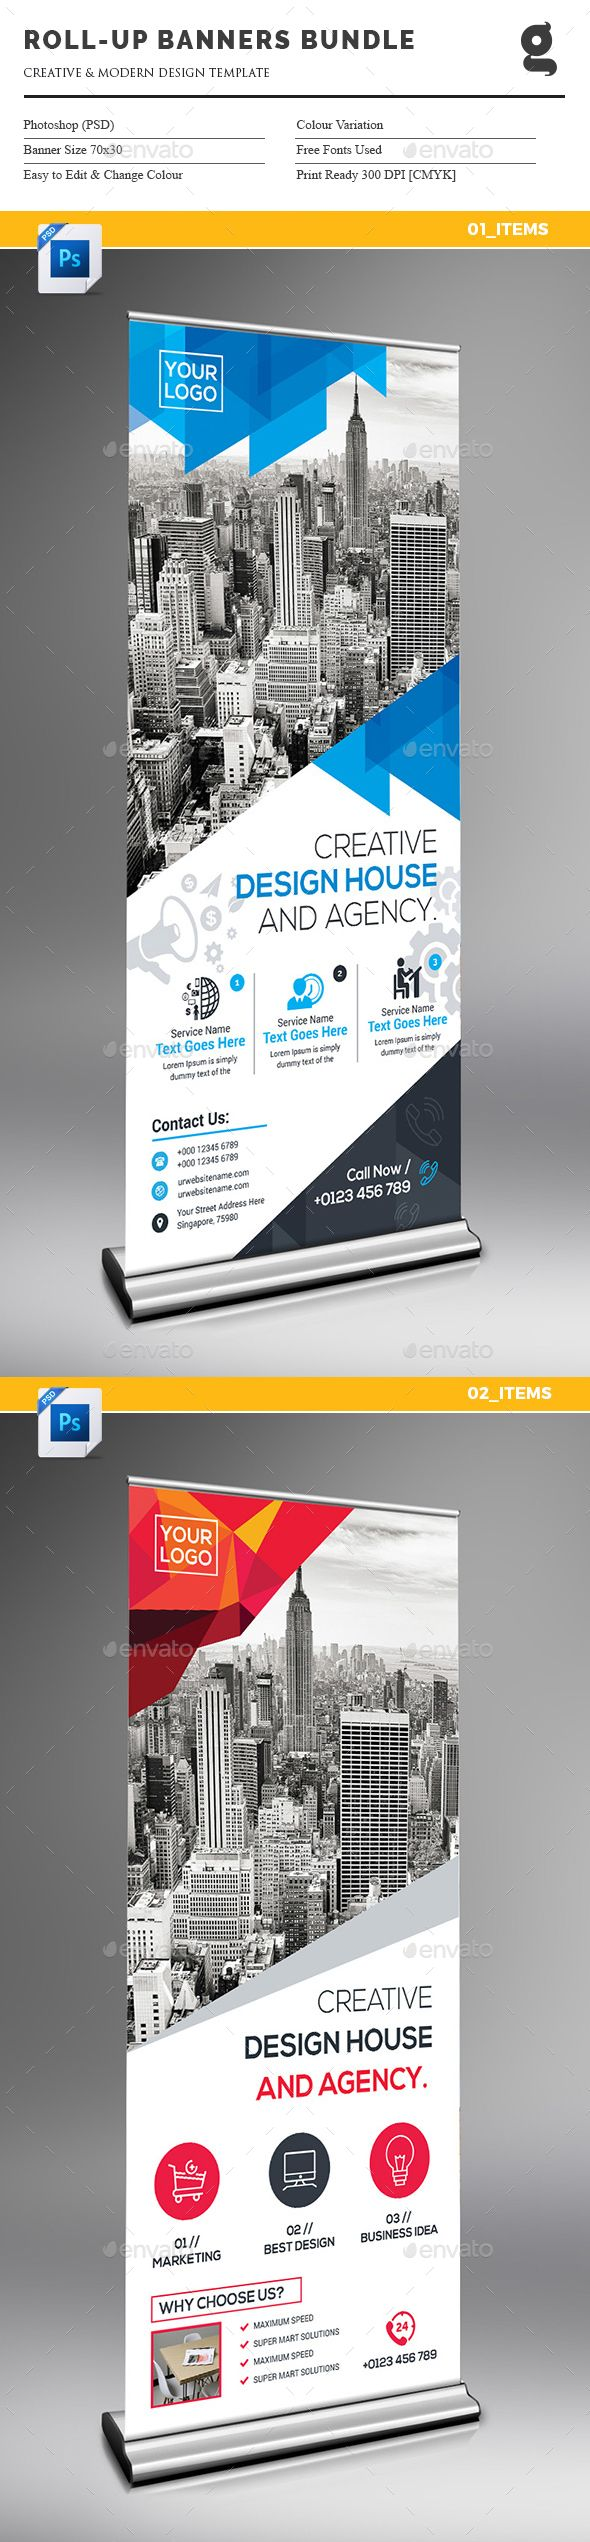 Roll-Up Banner Template PSD Bundle